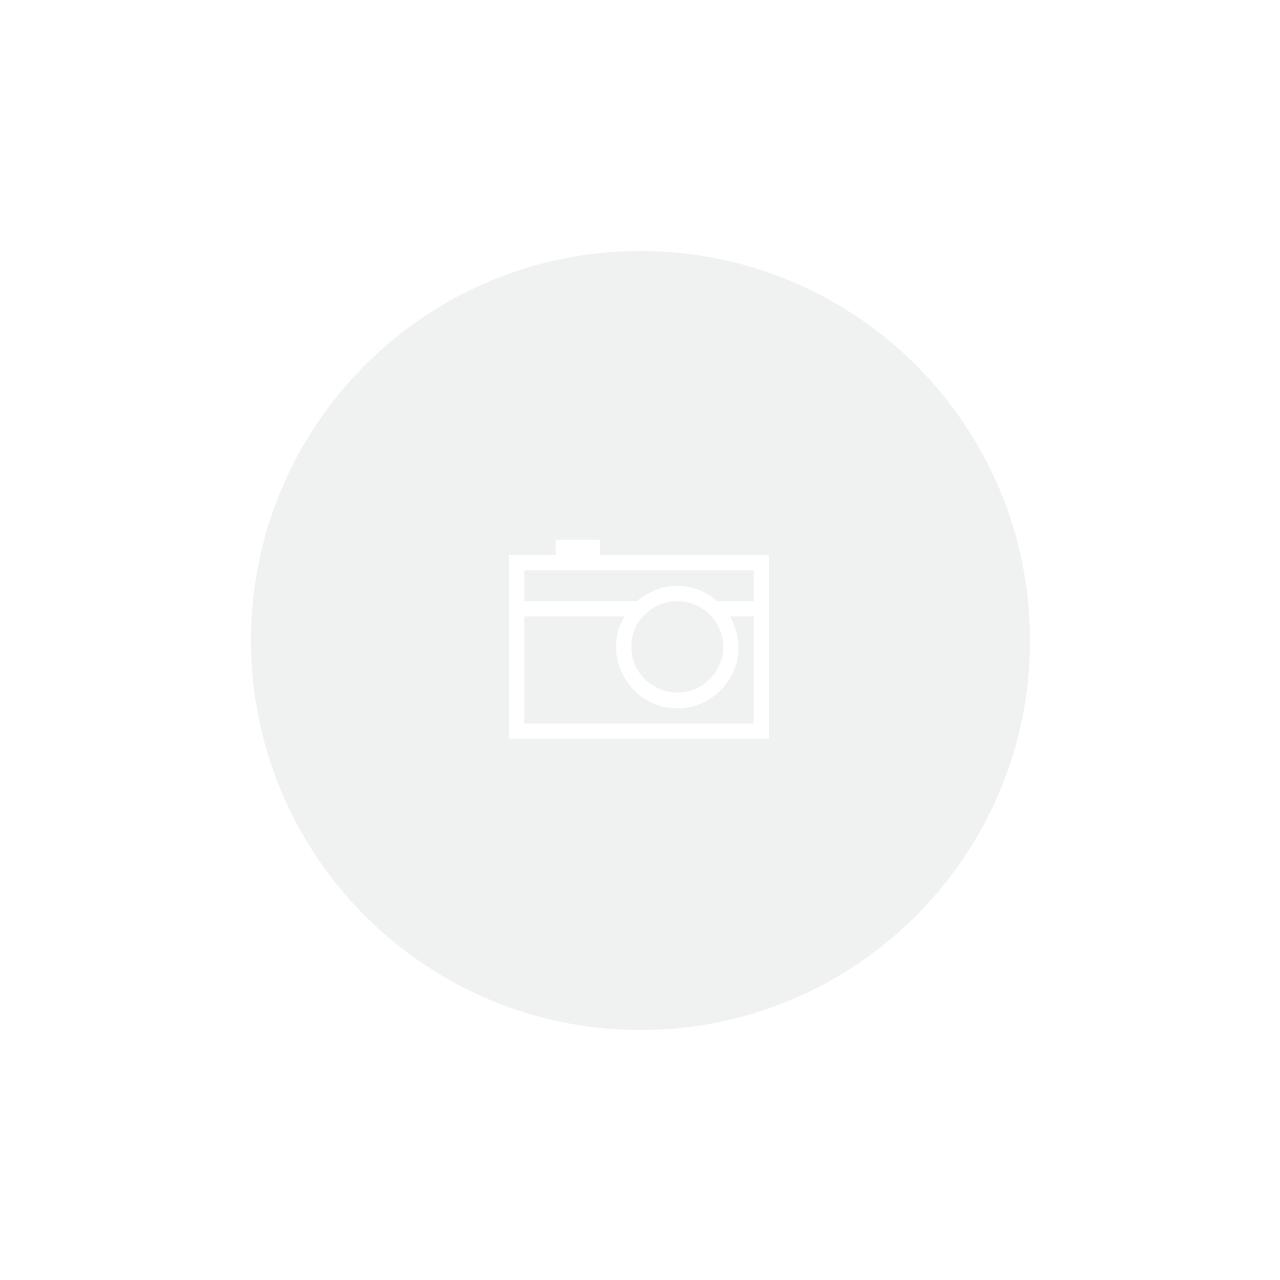 COROA 30D ICTUS NARROW WIDE BCD 104mm 4 FUROS (12V)